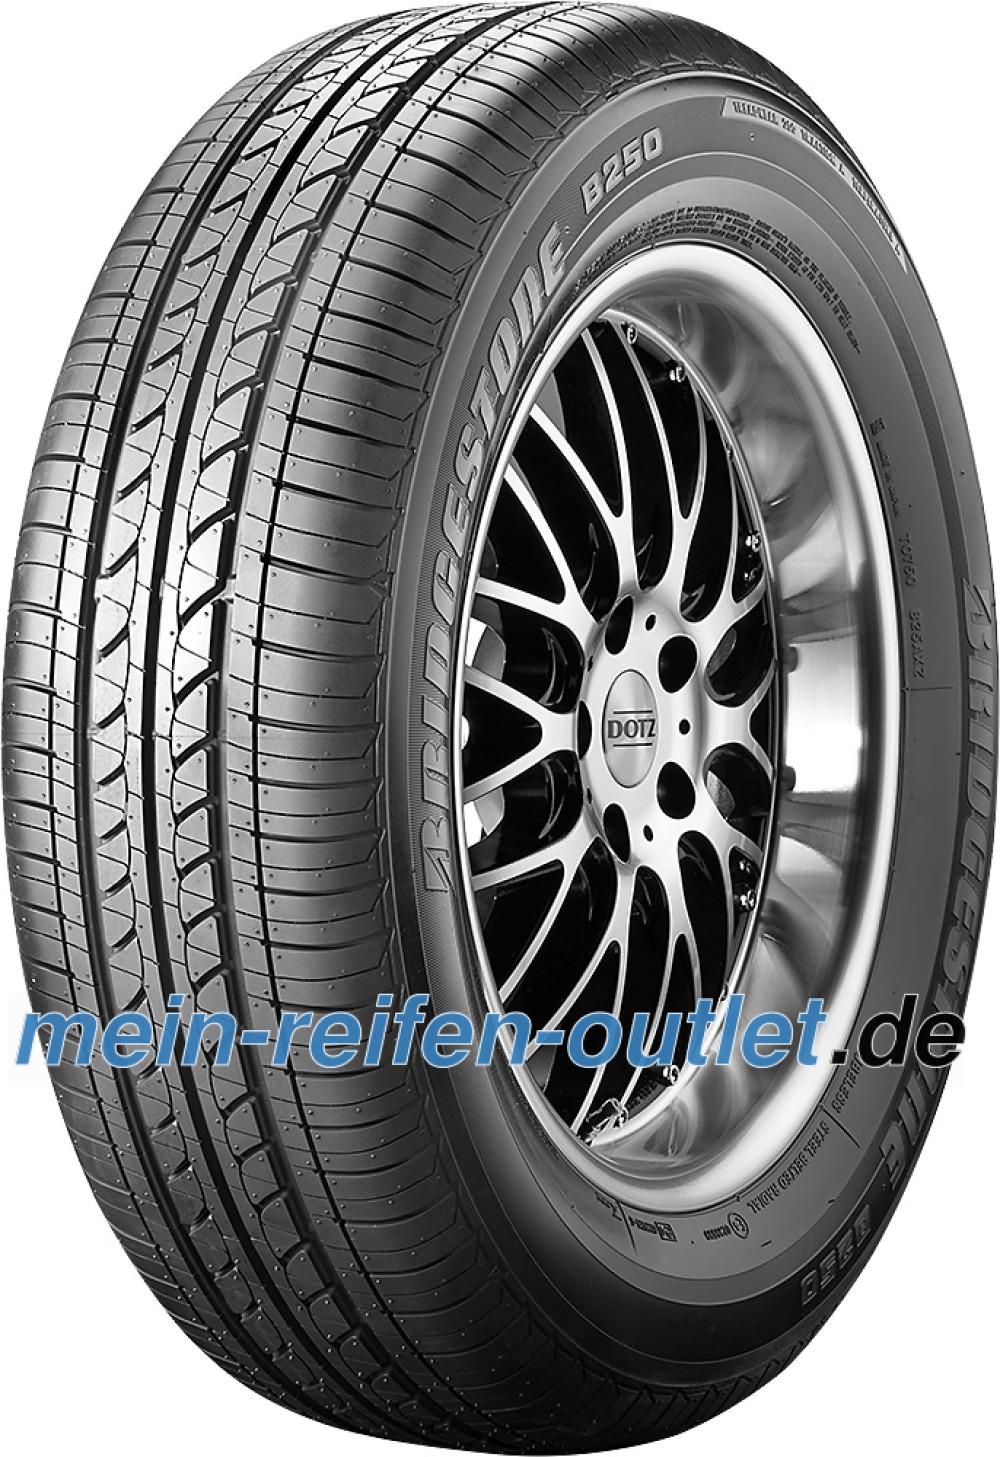 Bridgestone B 250 ( 175/60 R15 81H )